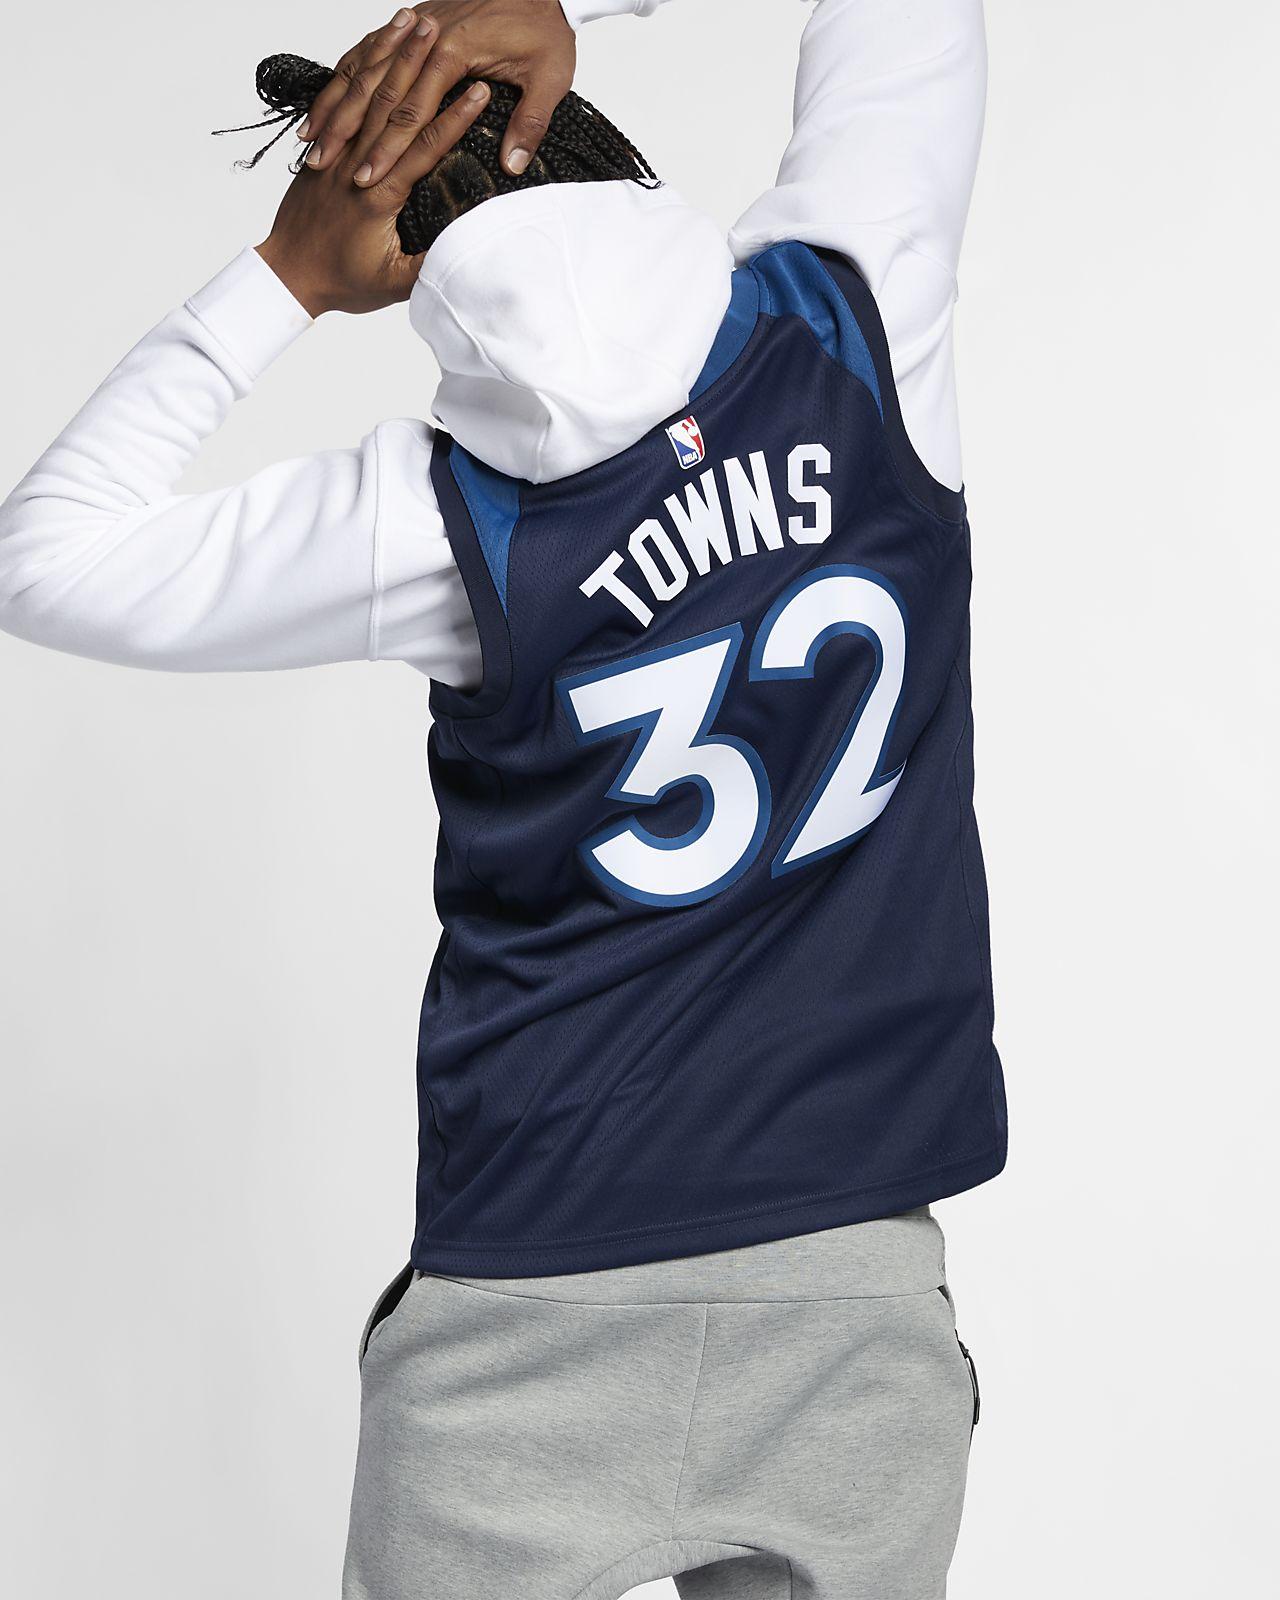 707247cfef38 ... Karl-Anthony Towns Icon Edition Swingman (Minnesota Timberwolves) Nike  NBA Connected Trikot für